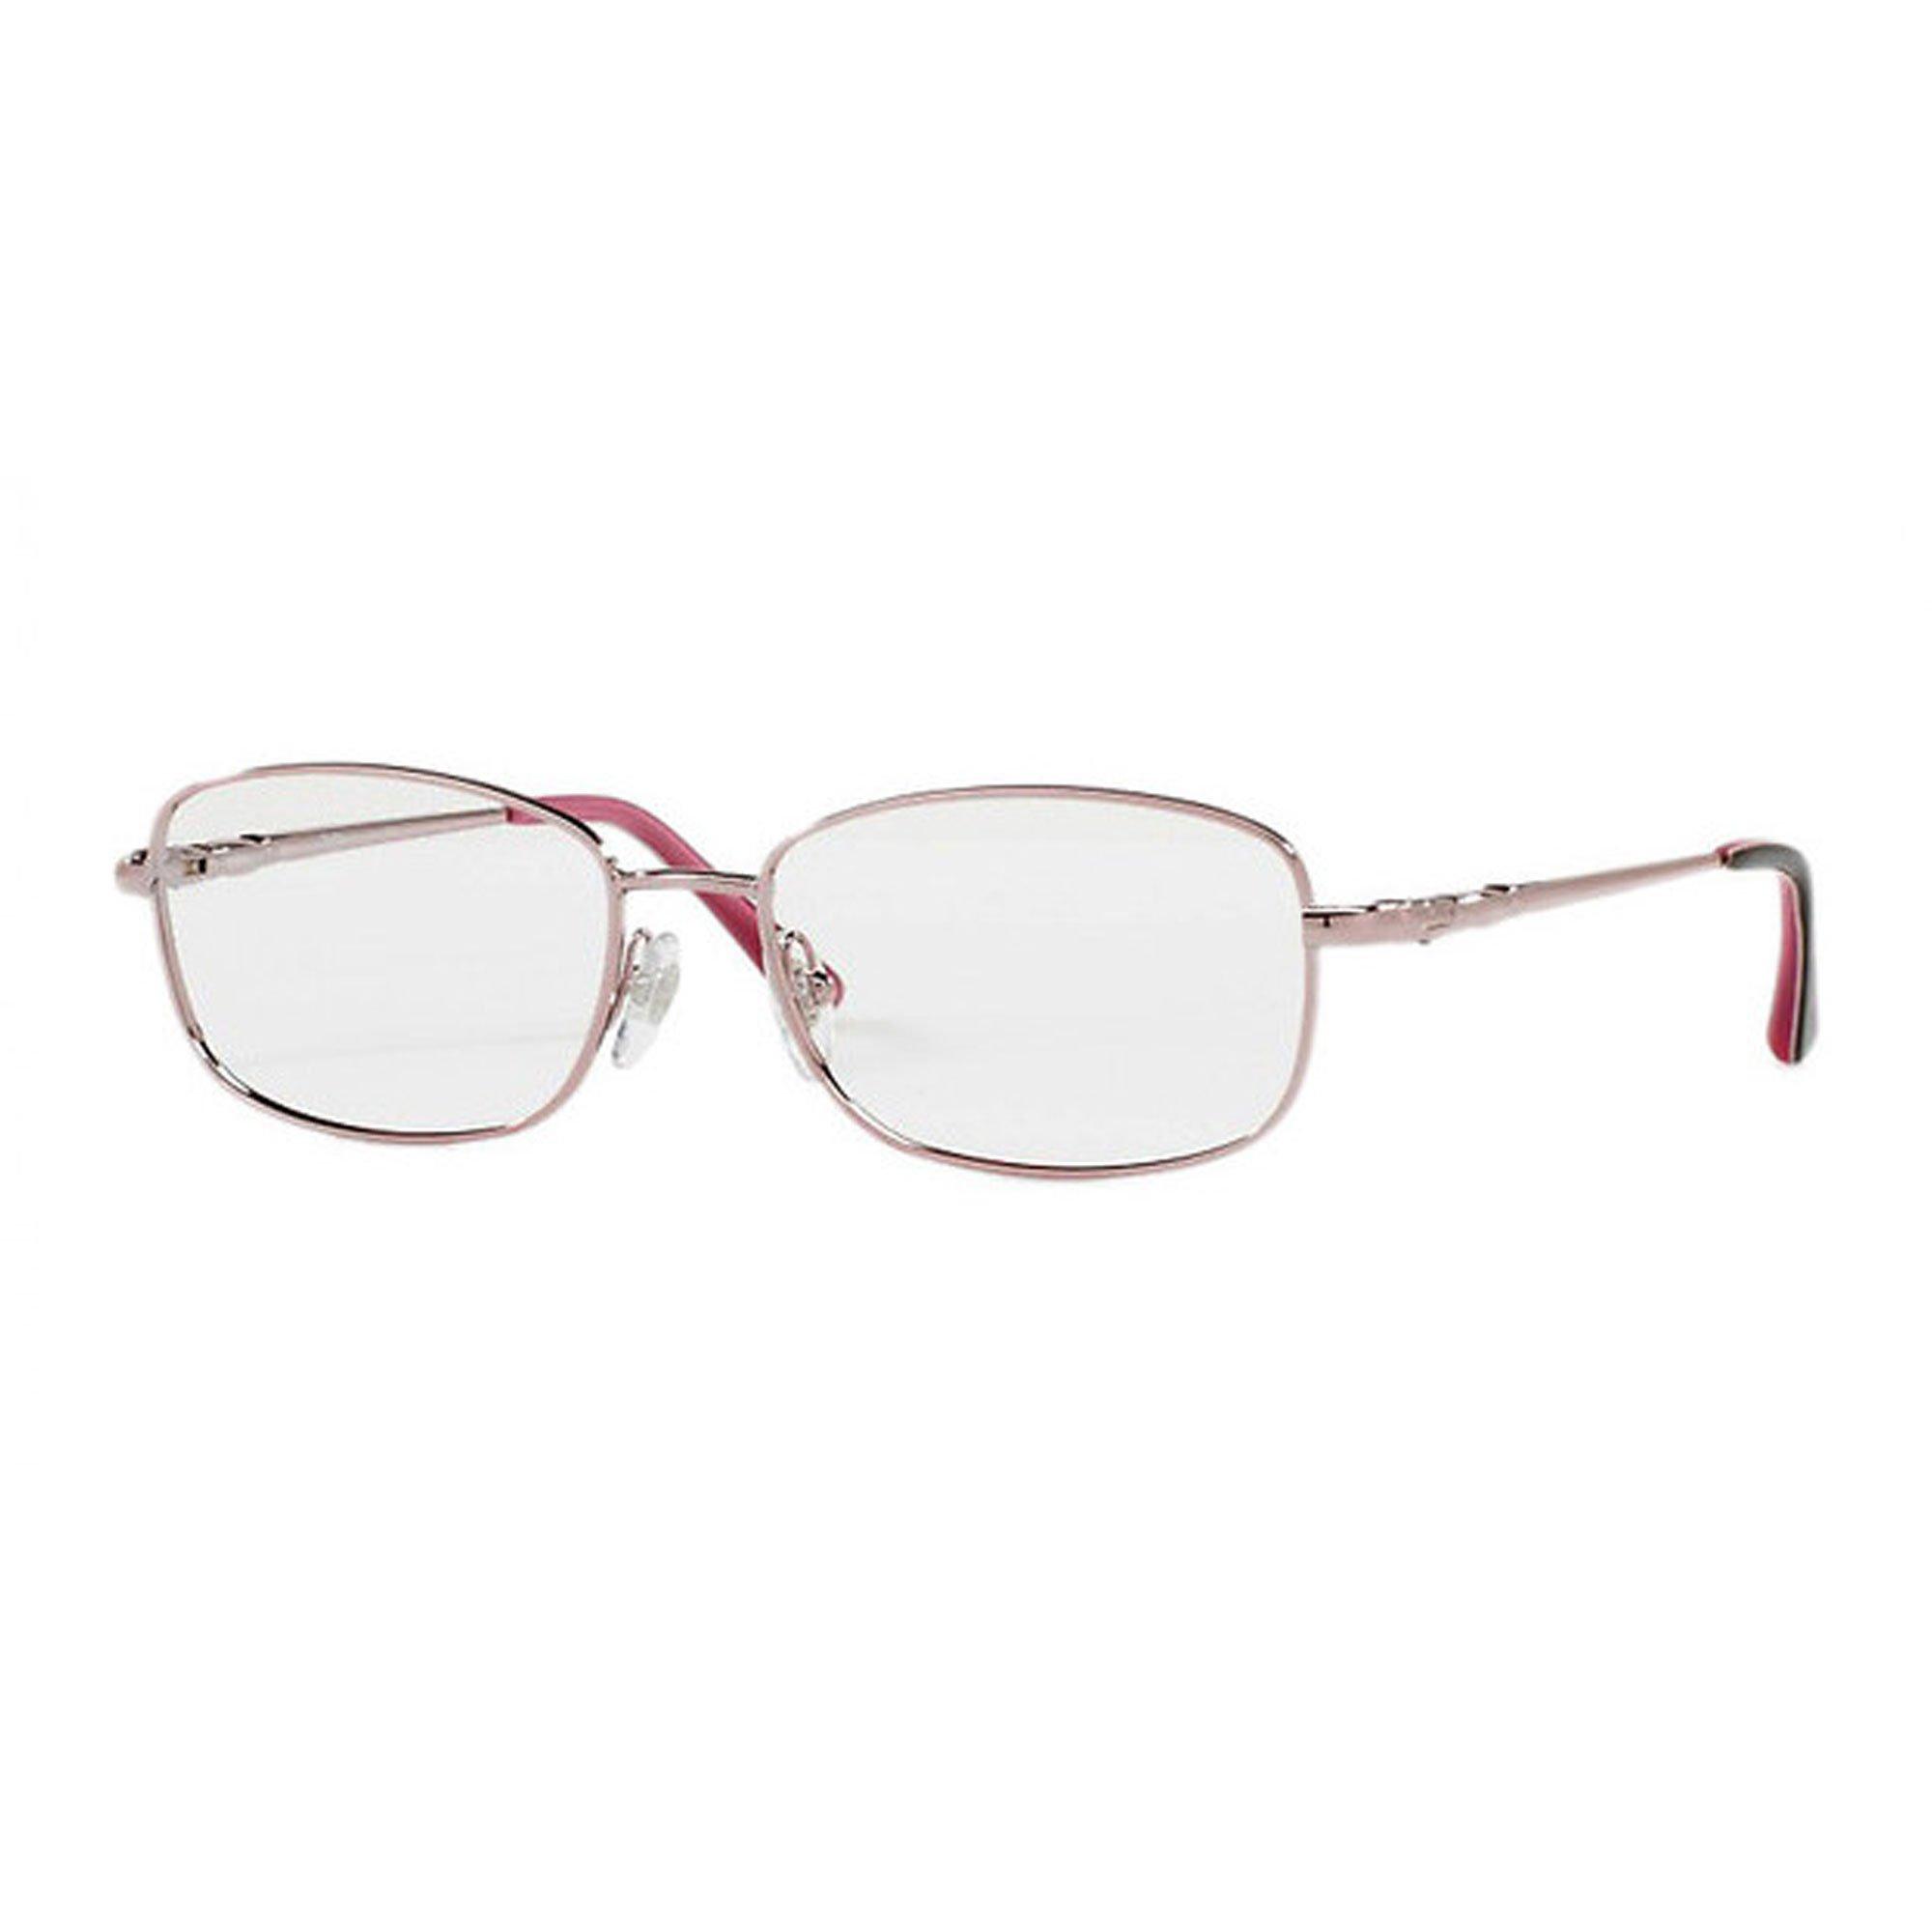 Sferoflex Sf2573 490 Occhiali da vista Eyeglasses donna 2016 Brille ...